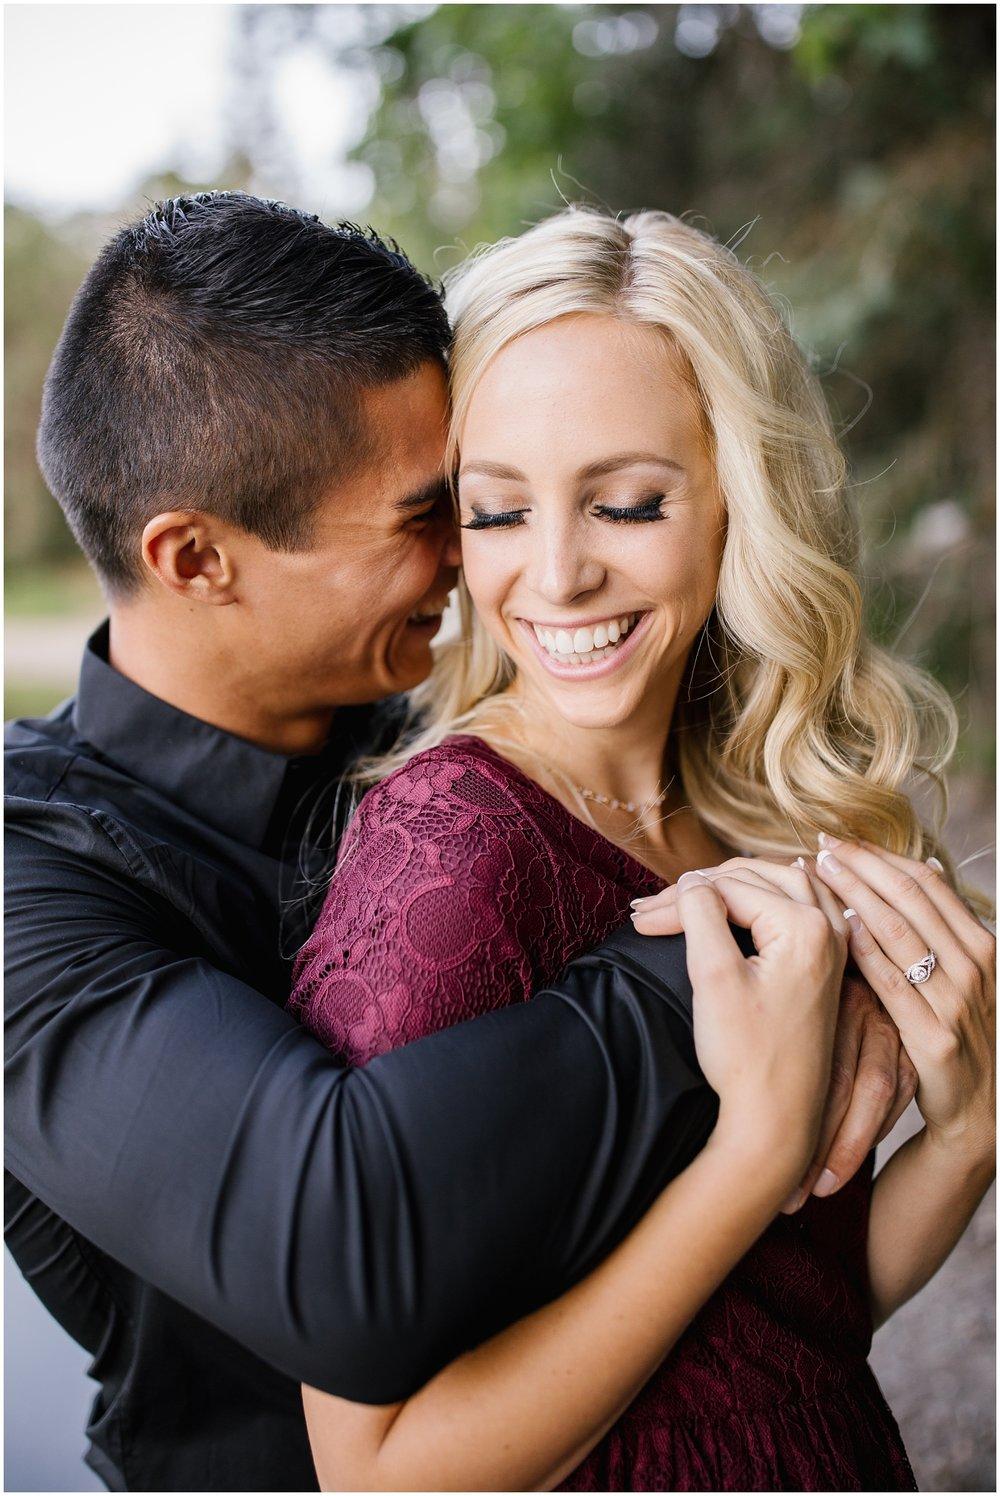 HCengagements-79_Lizzie-B-Imagery-Utah-Wedding-Photographer-Park-City-Salt-Lake-City-Payson-Canyon-Engagement-Session.jpg